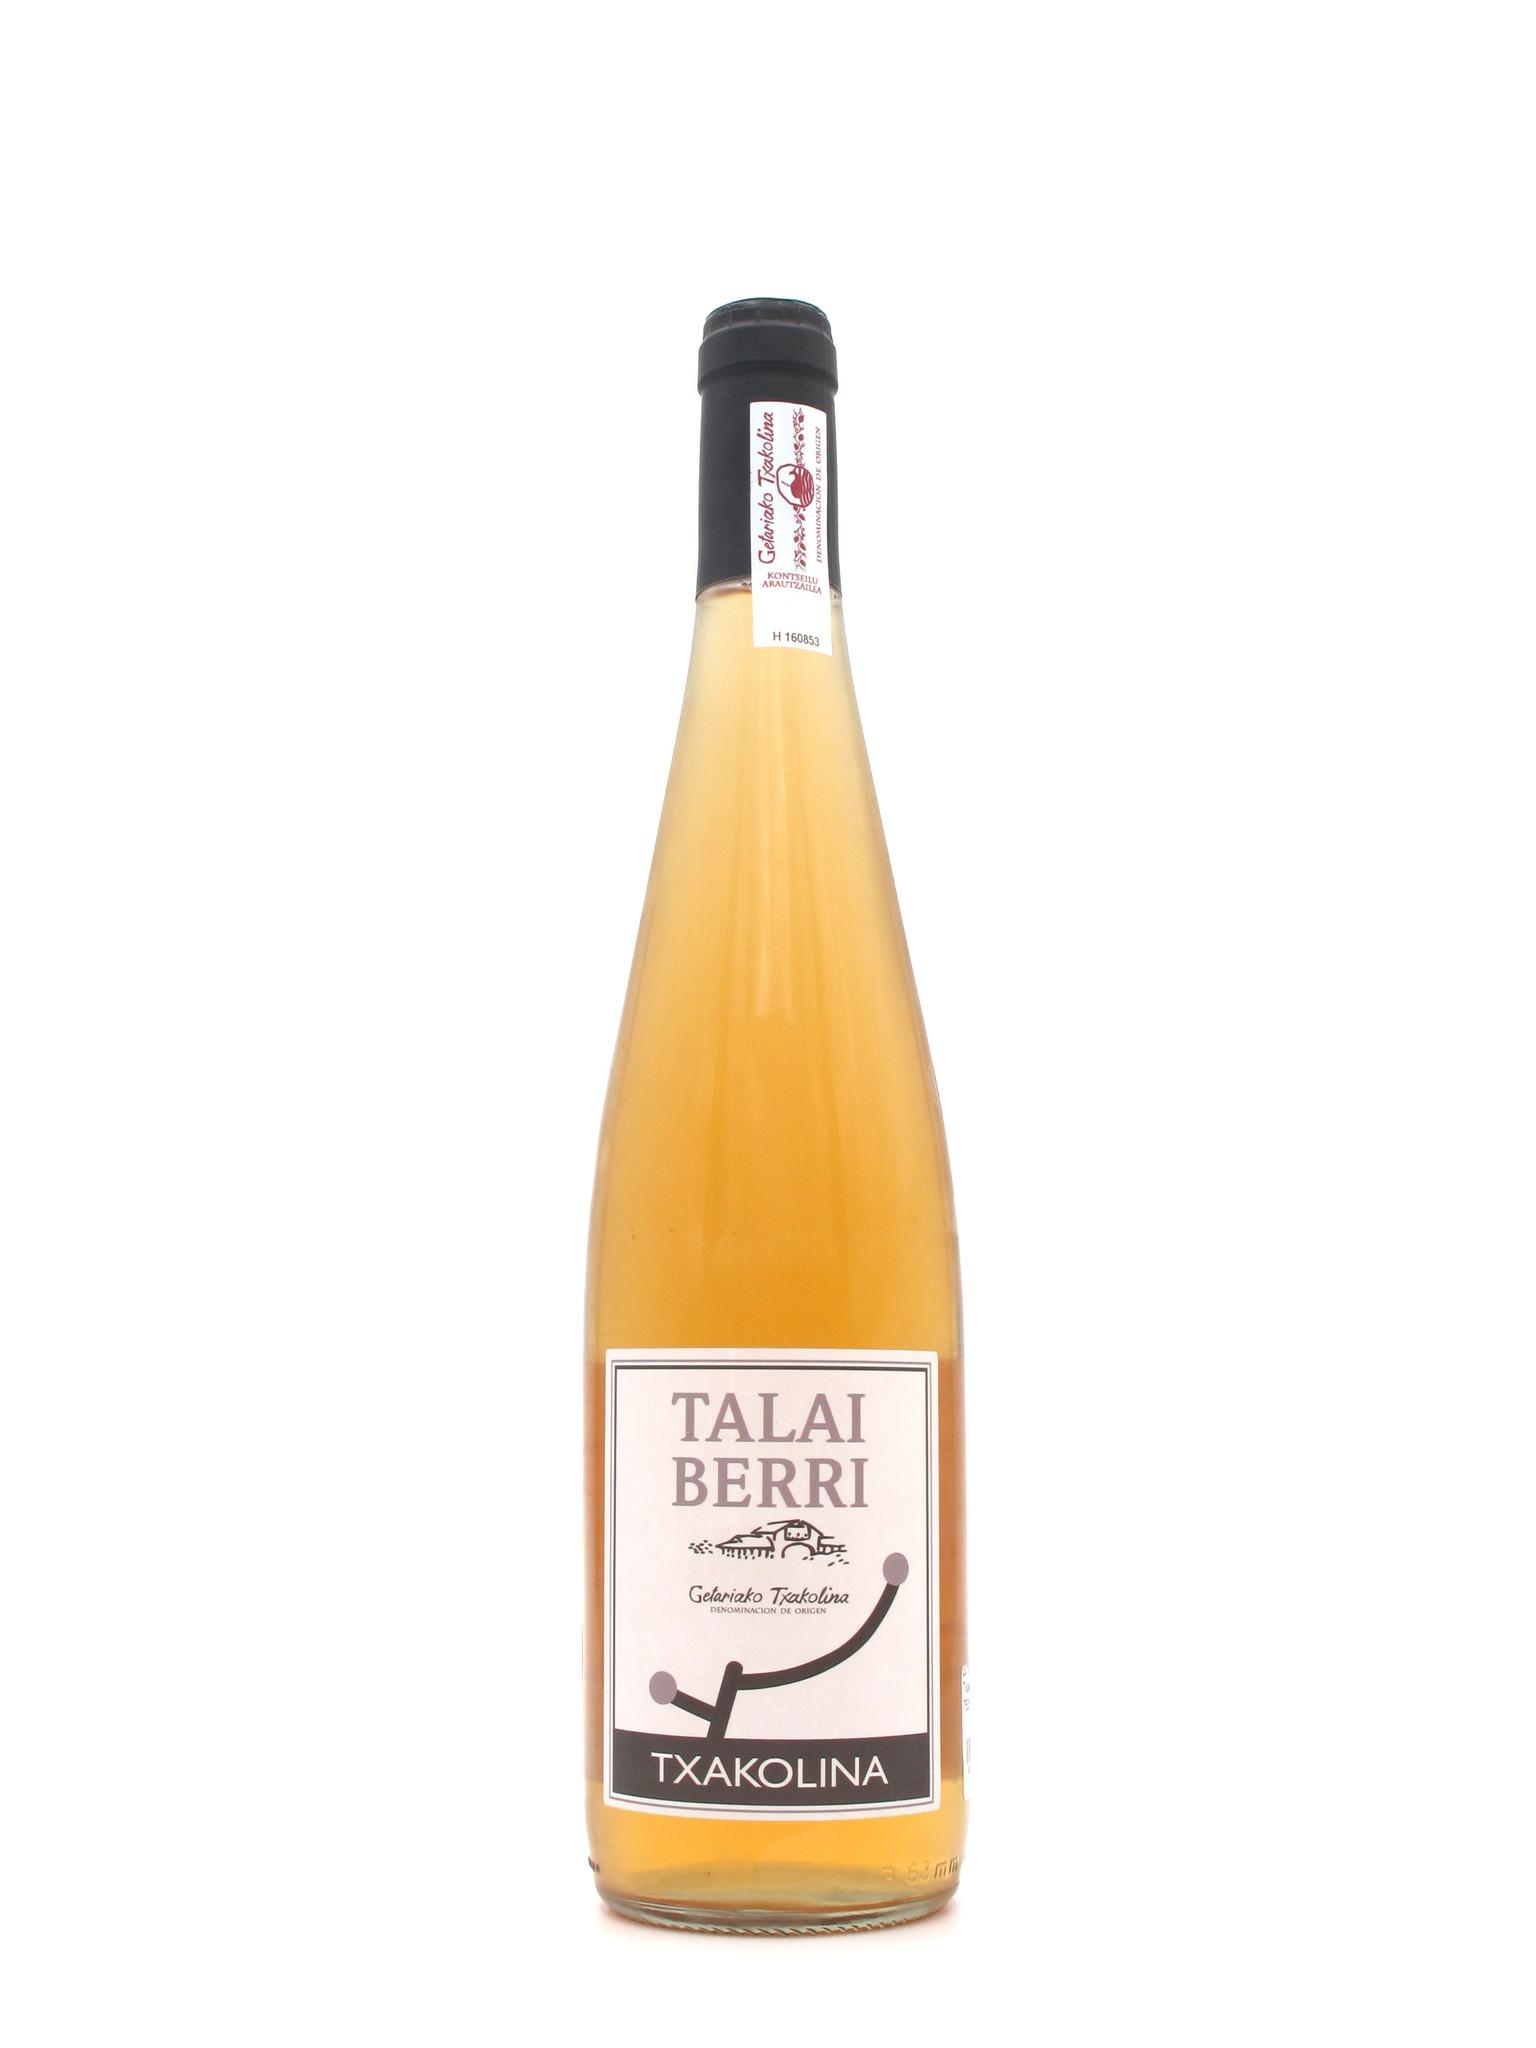 Talai Berri 2018 Talai Berri Txakolina Rosé 750ml